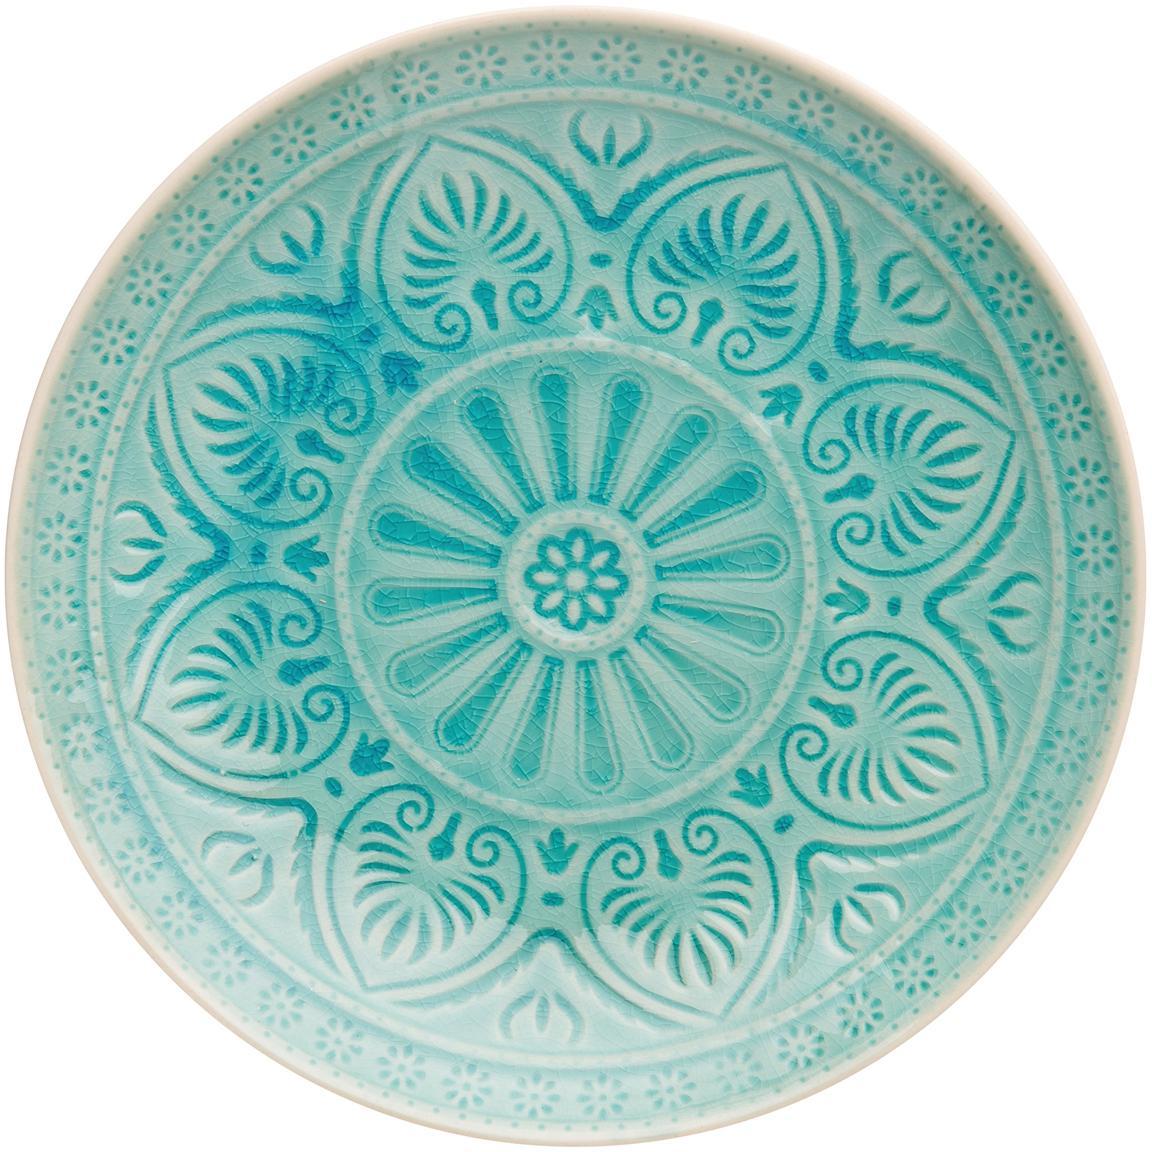 Plato llano artesanales Sumatra, Gres, Turquesa, Ø 25 cm